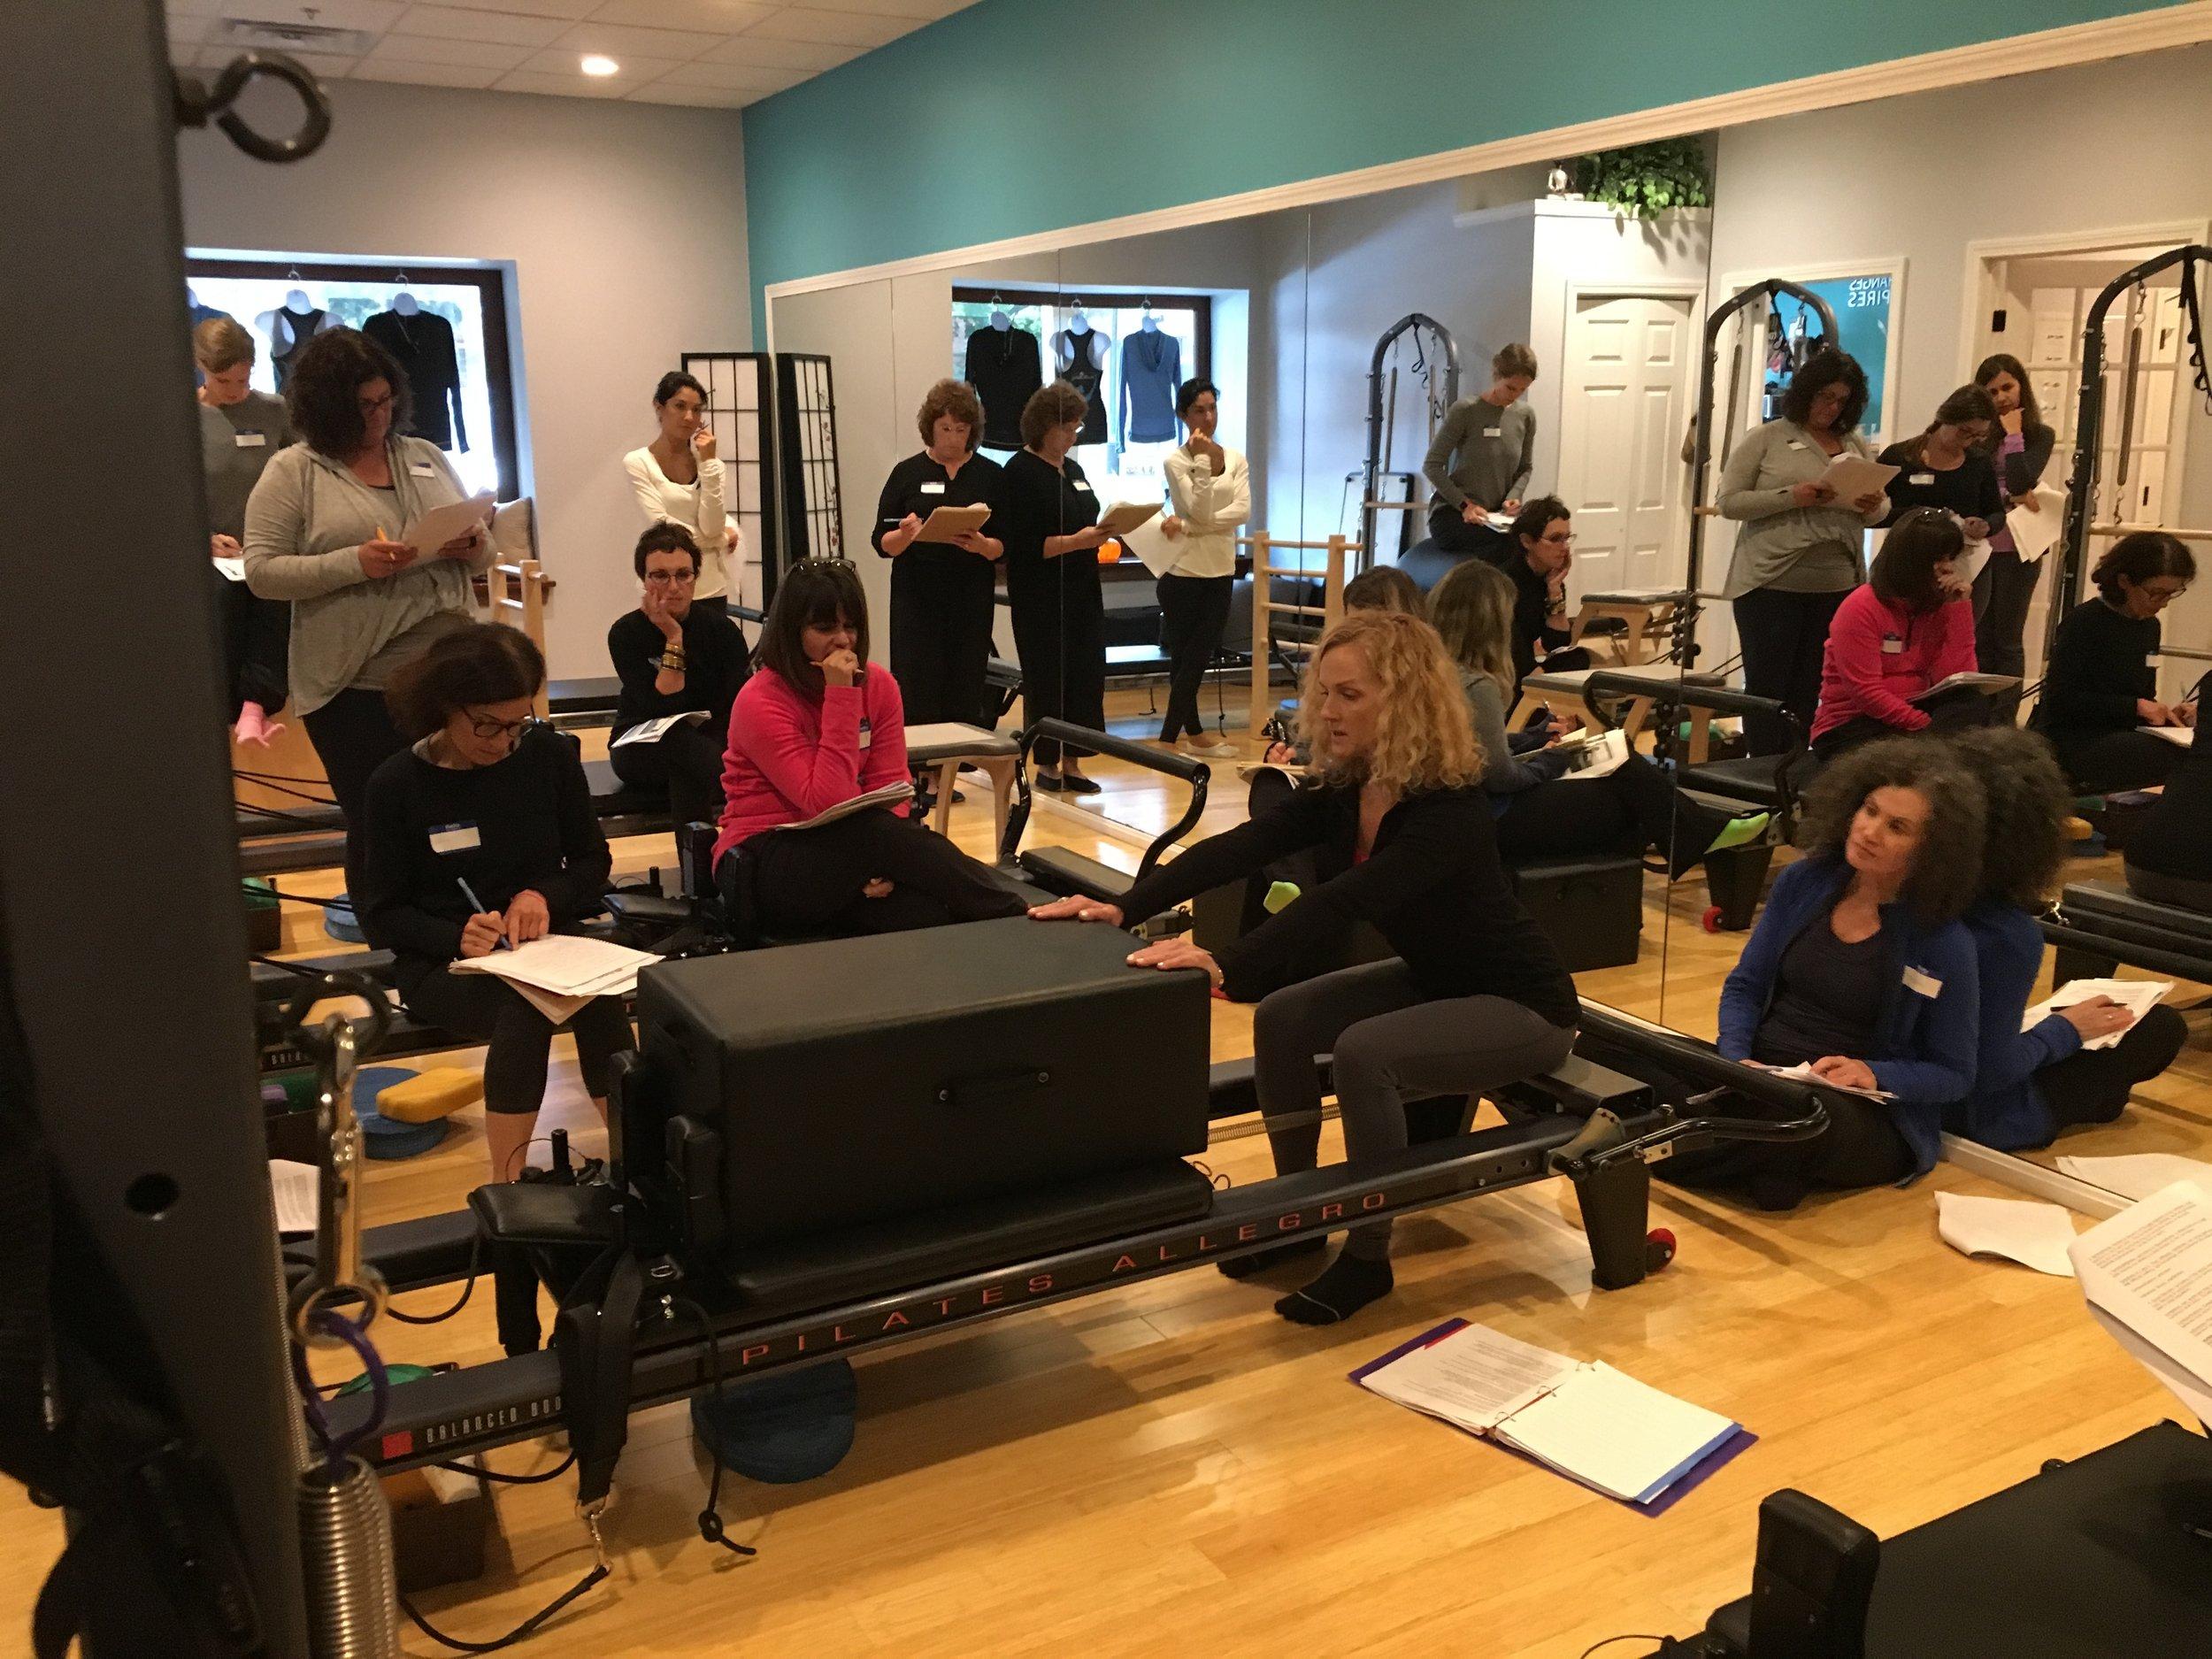 Healthy-Changes-Pilates-Reading-BASI-Pilates-Continuing-Education.JPG